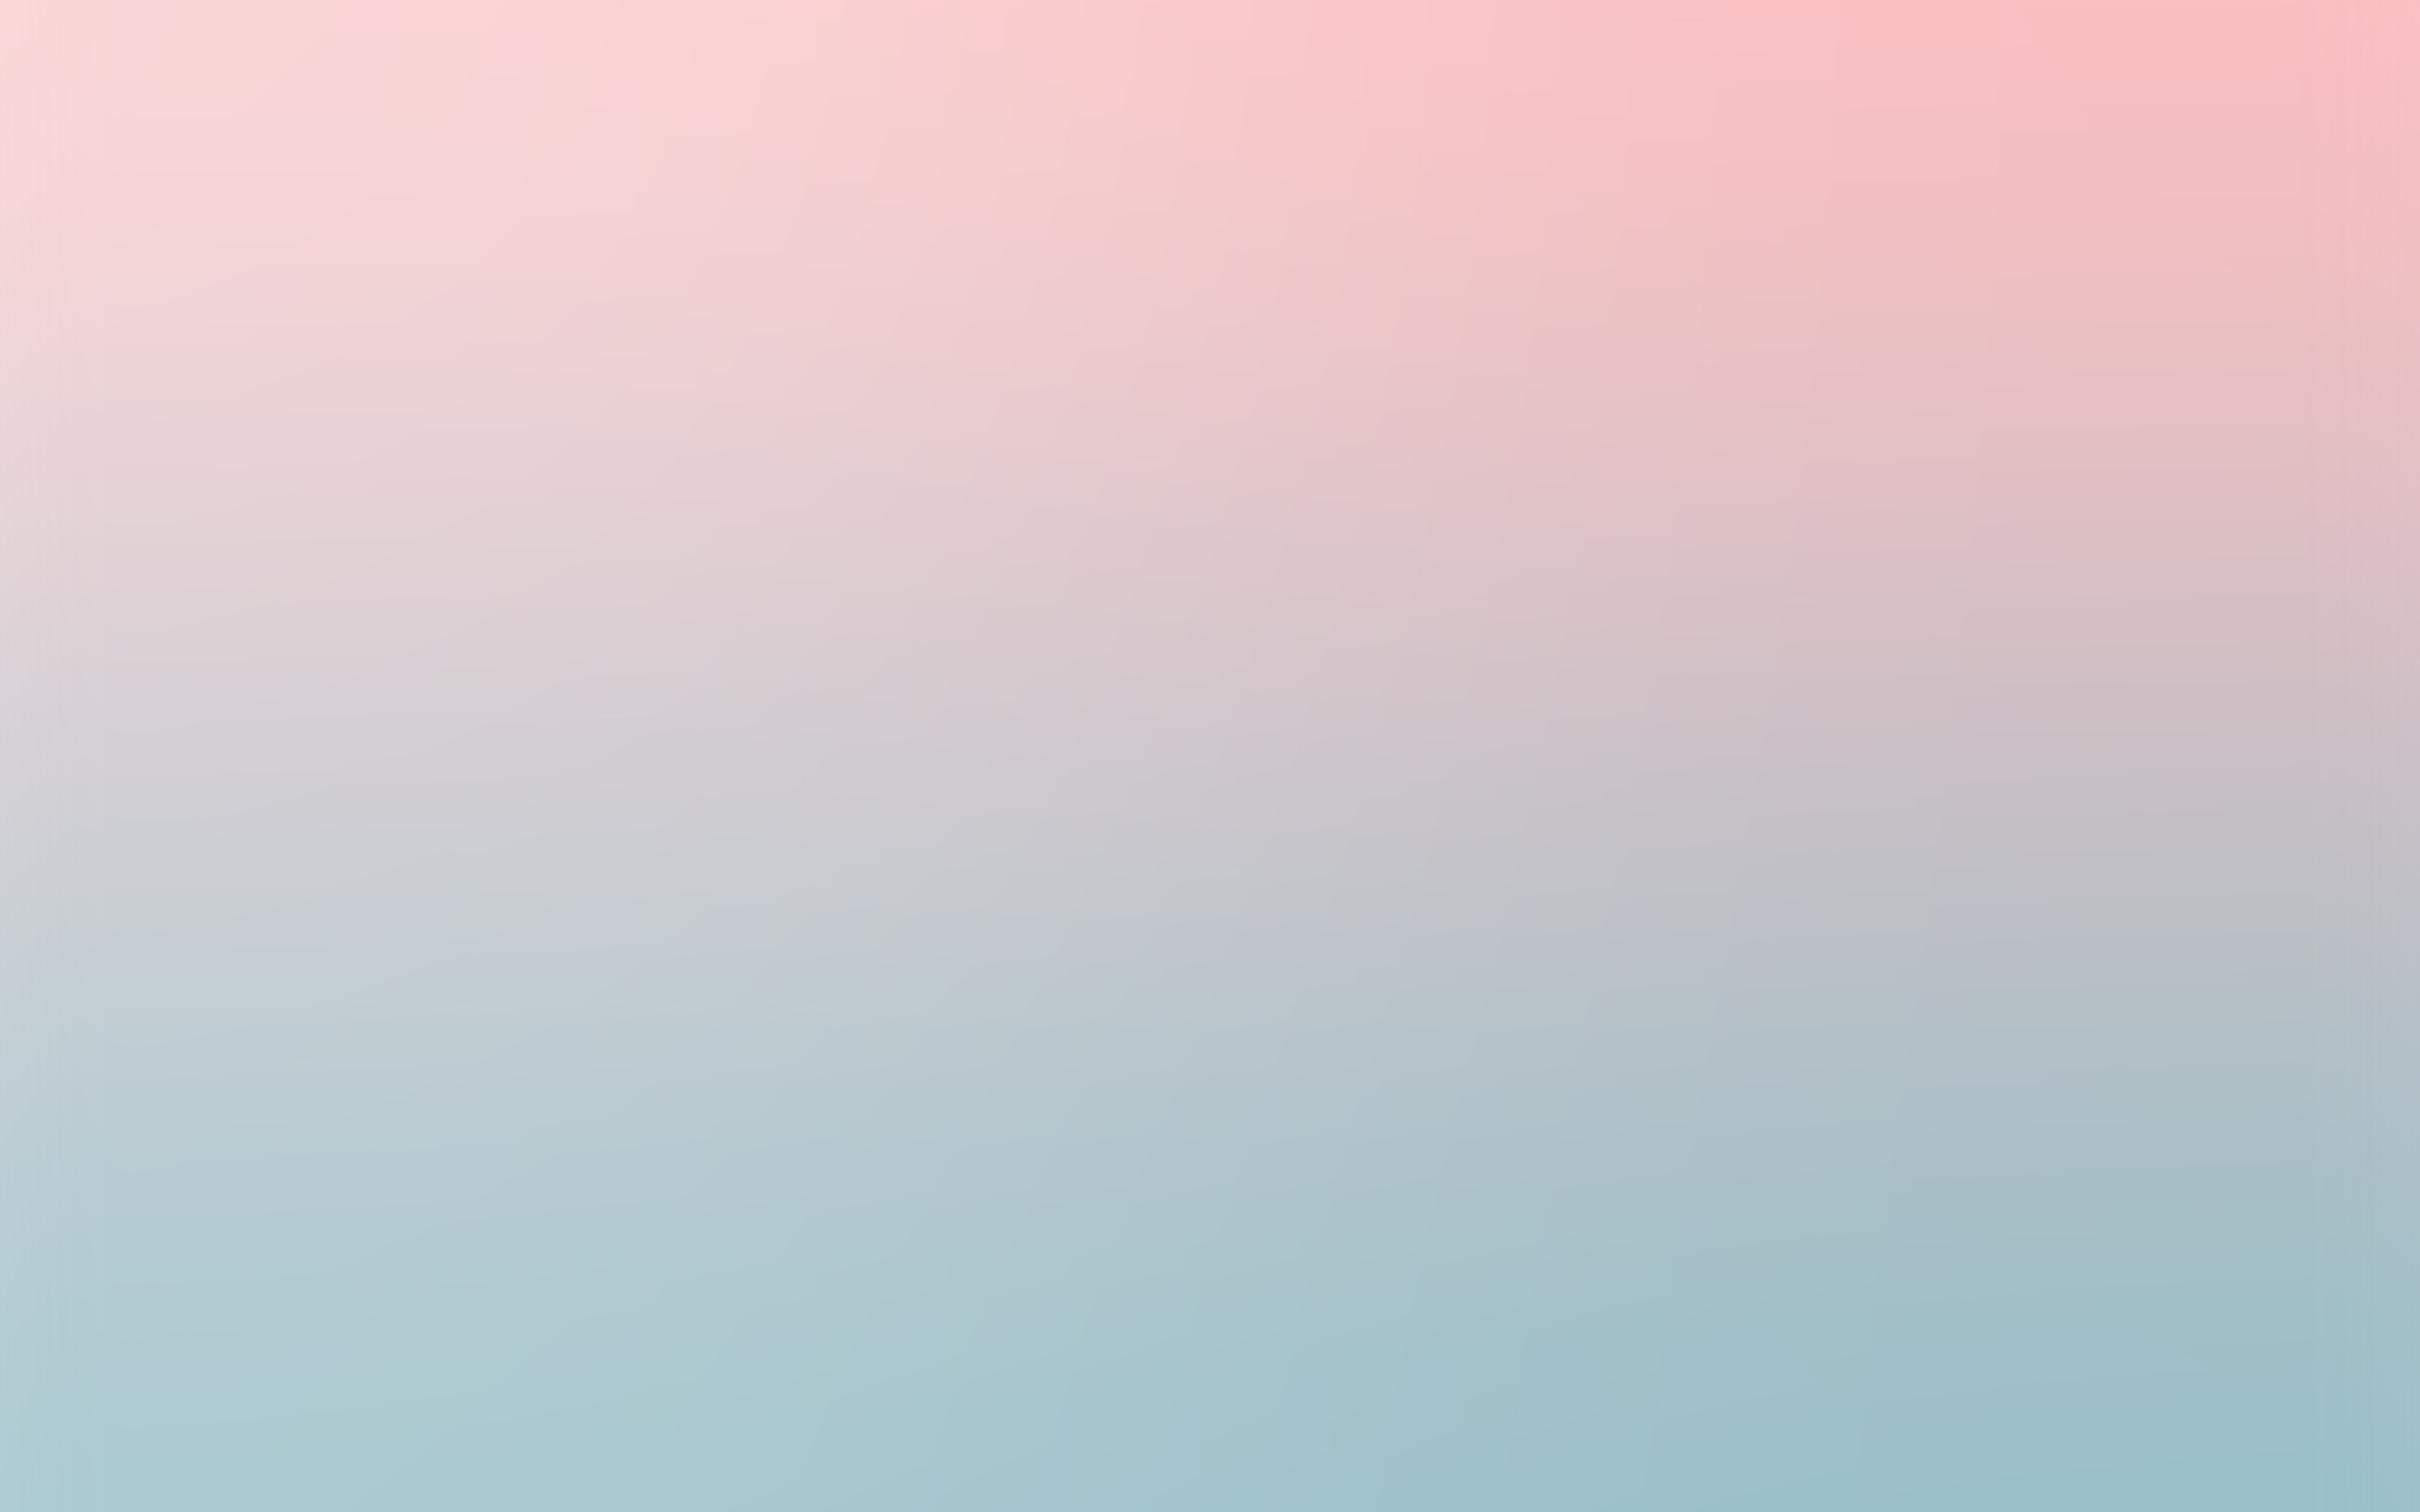 Blue Slate Background